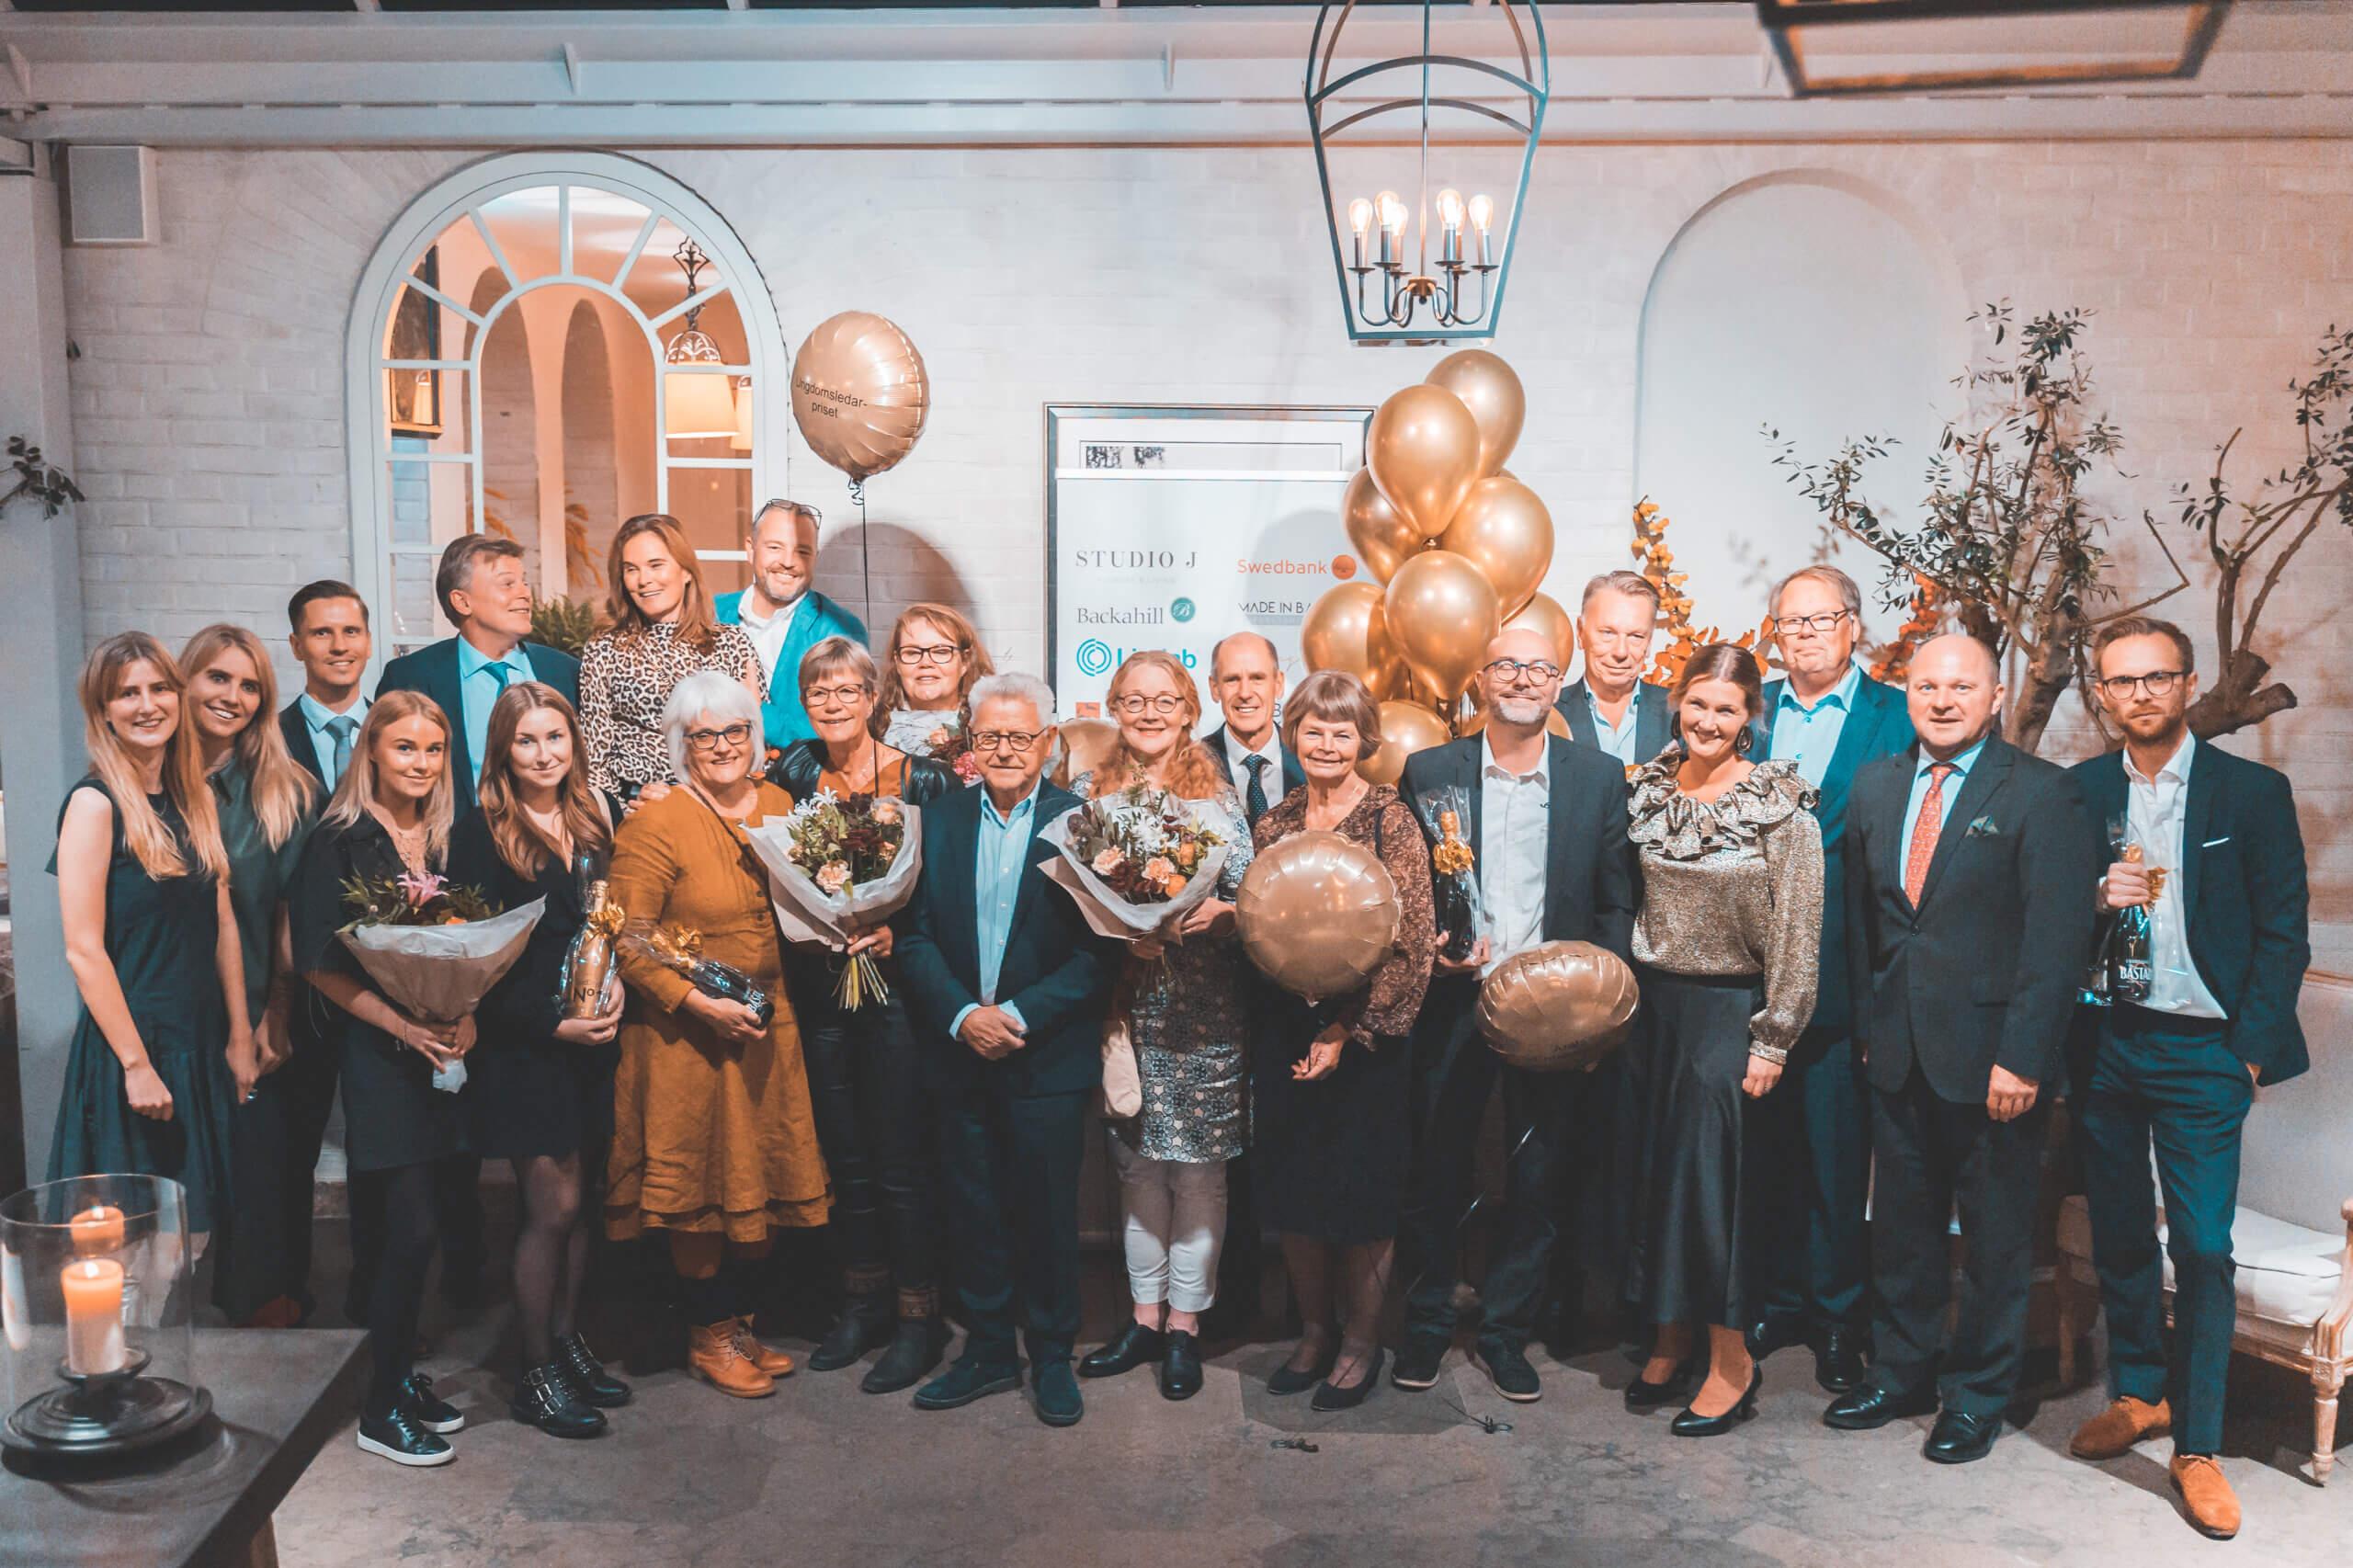 Alle vinnere på årets Business Party i Båstad